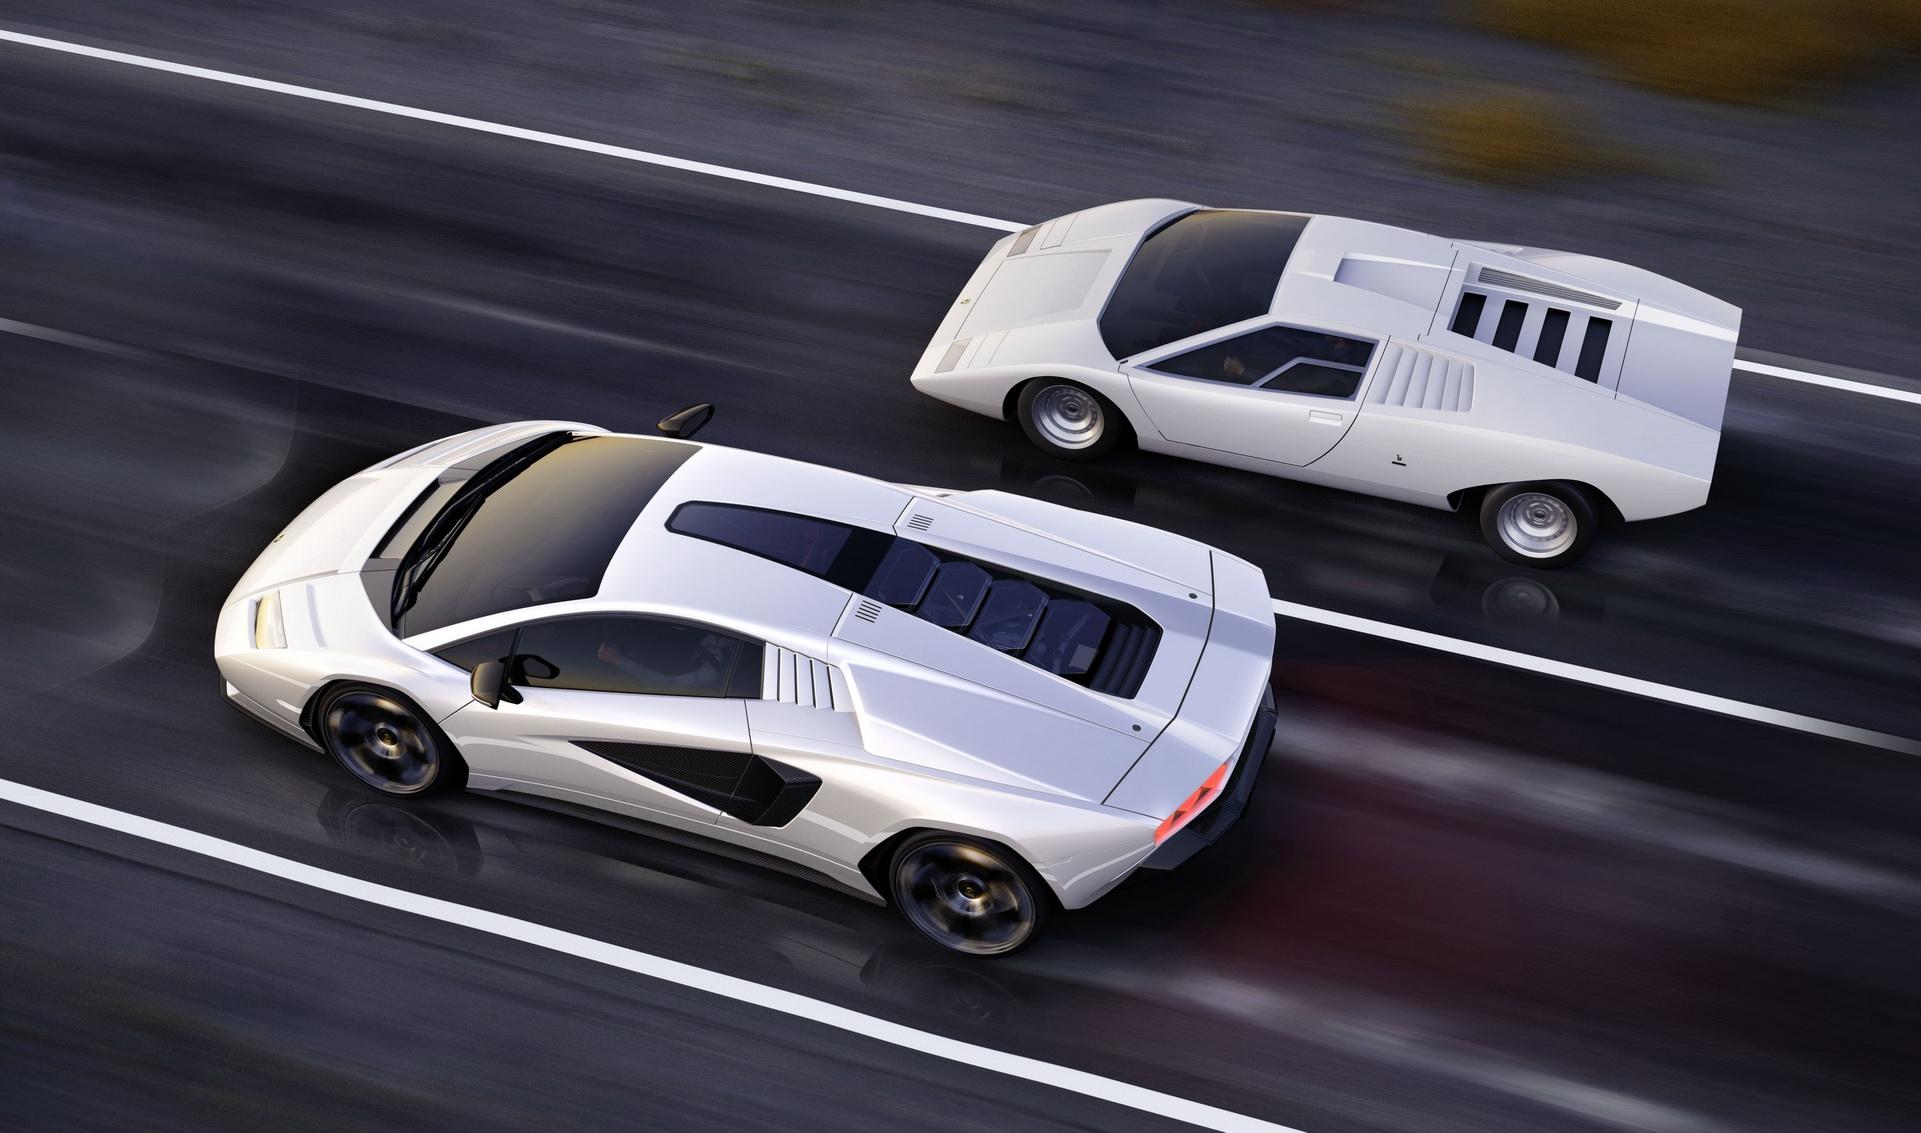 2022 Lamborghini Countach LPI 800-4 Top Wallpapers (8)